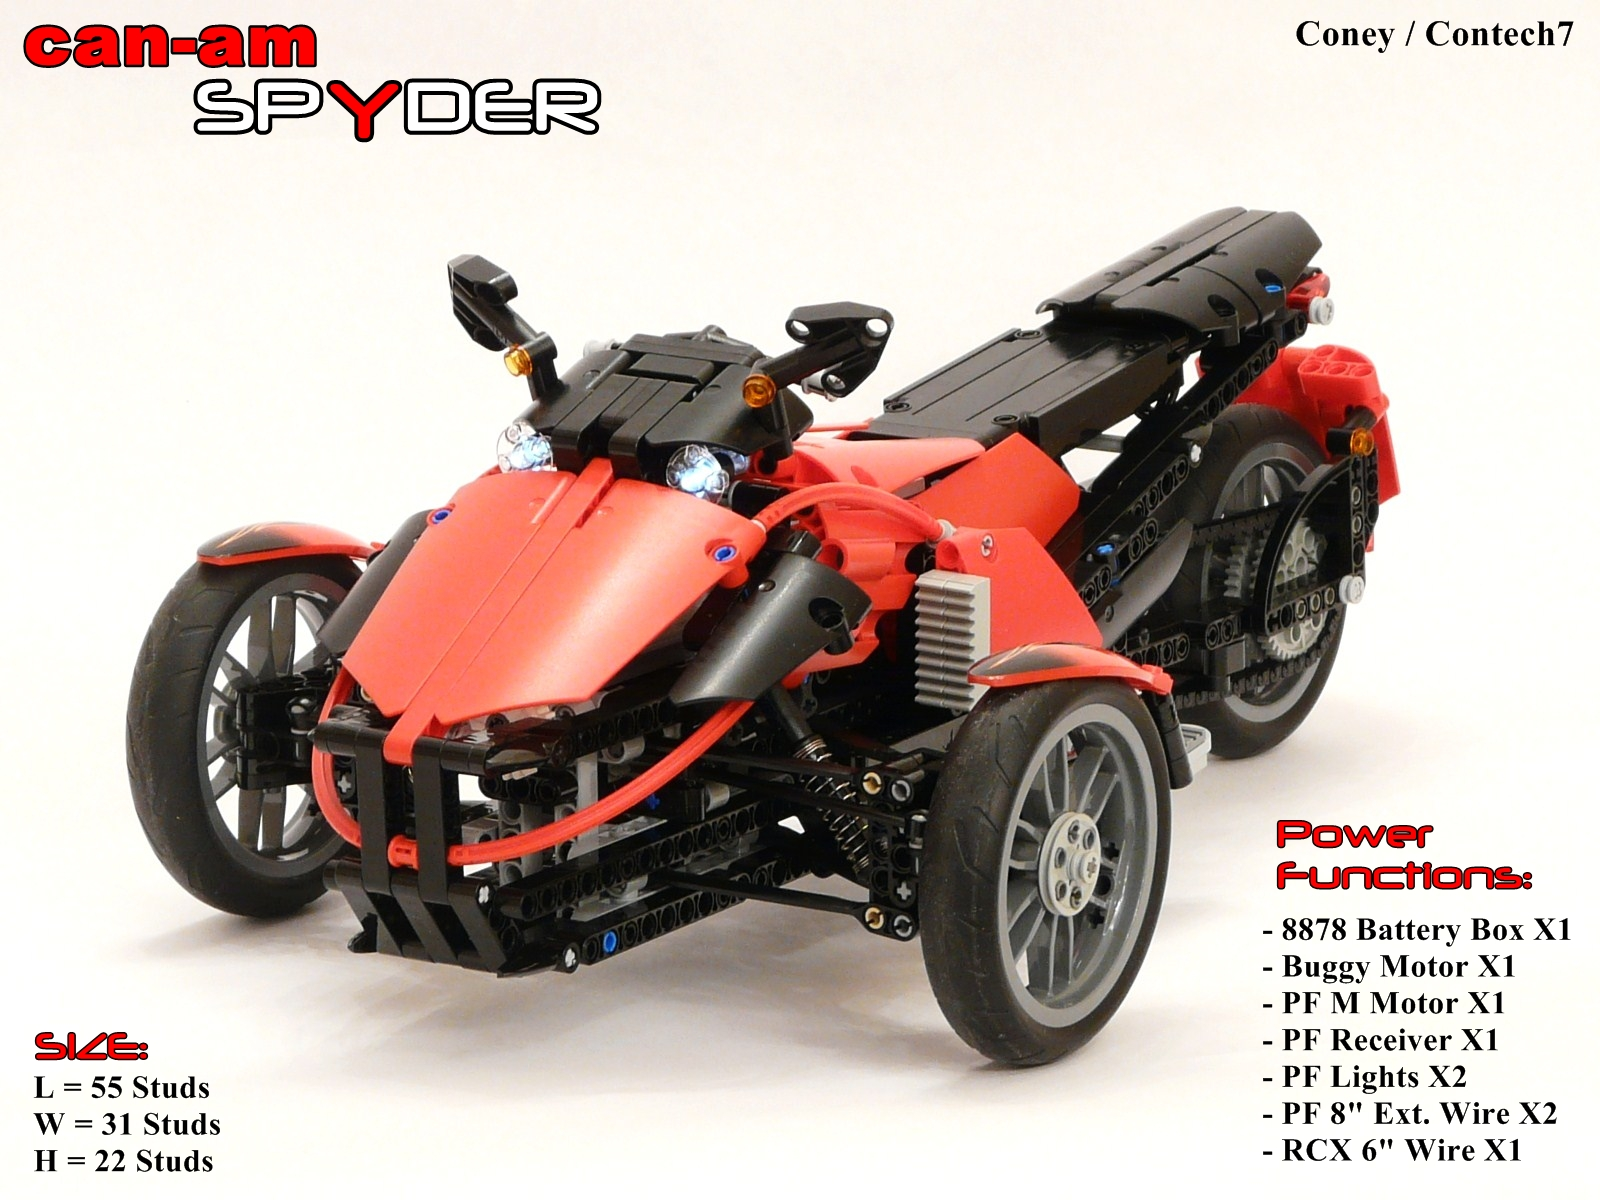 Bombardier Recreational Products >> TechnicBRICKs: Week TechVideo, 2011 #01 - Can-Am brand